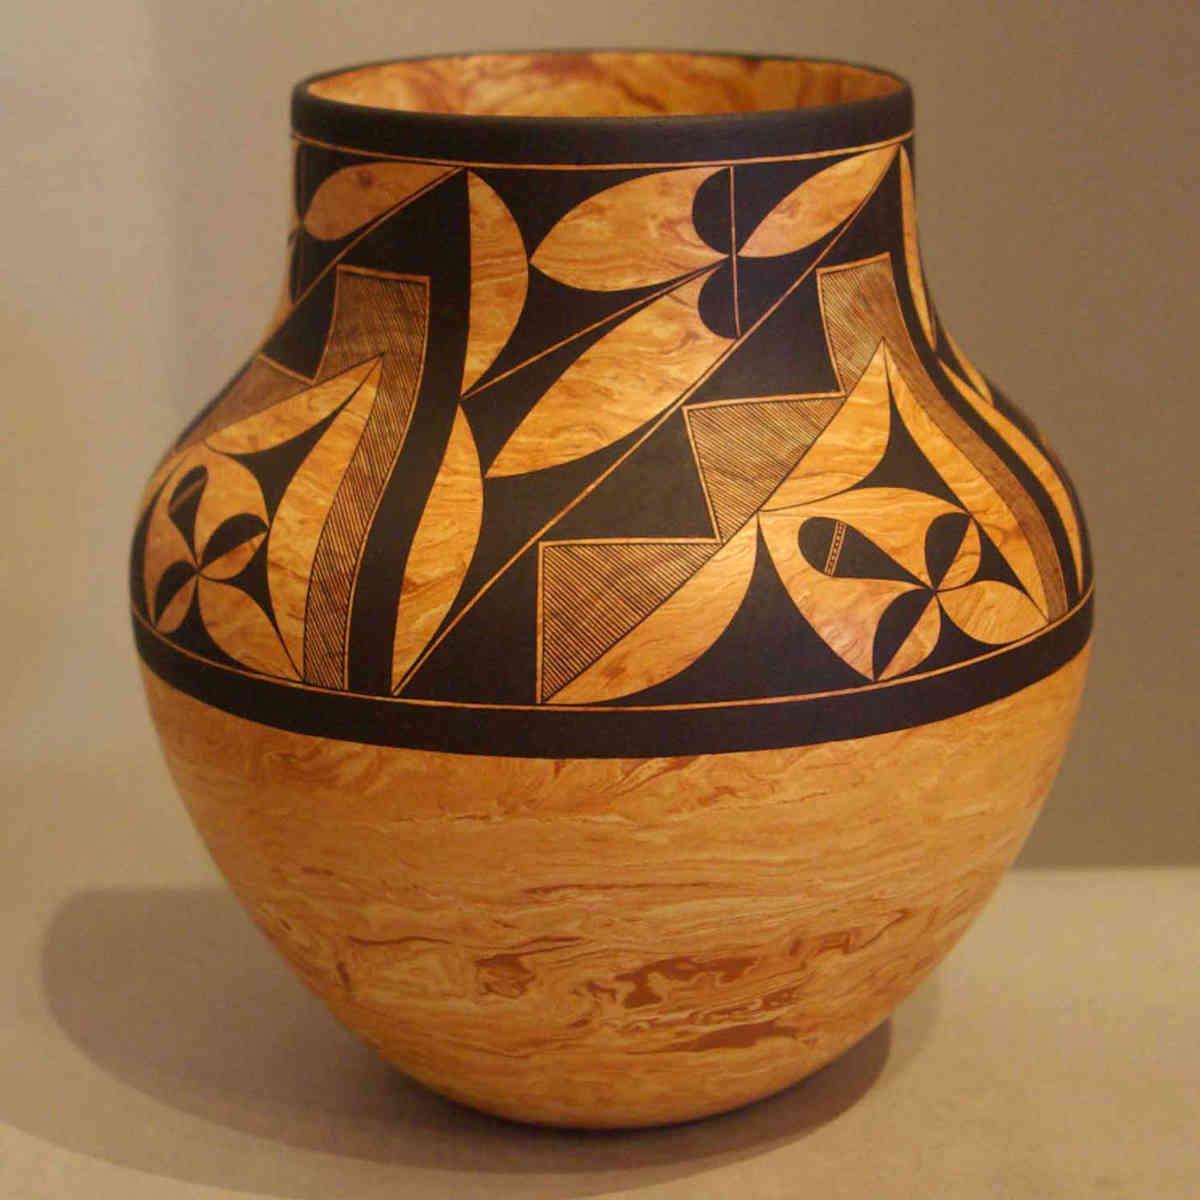 Calvin analla jr pots 1 laguna pueblo potters for Clay pots designs